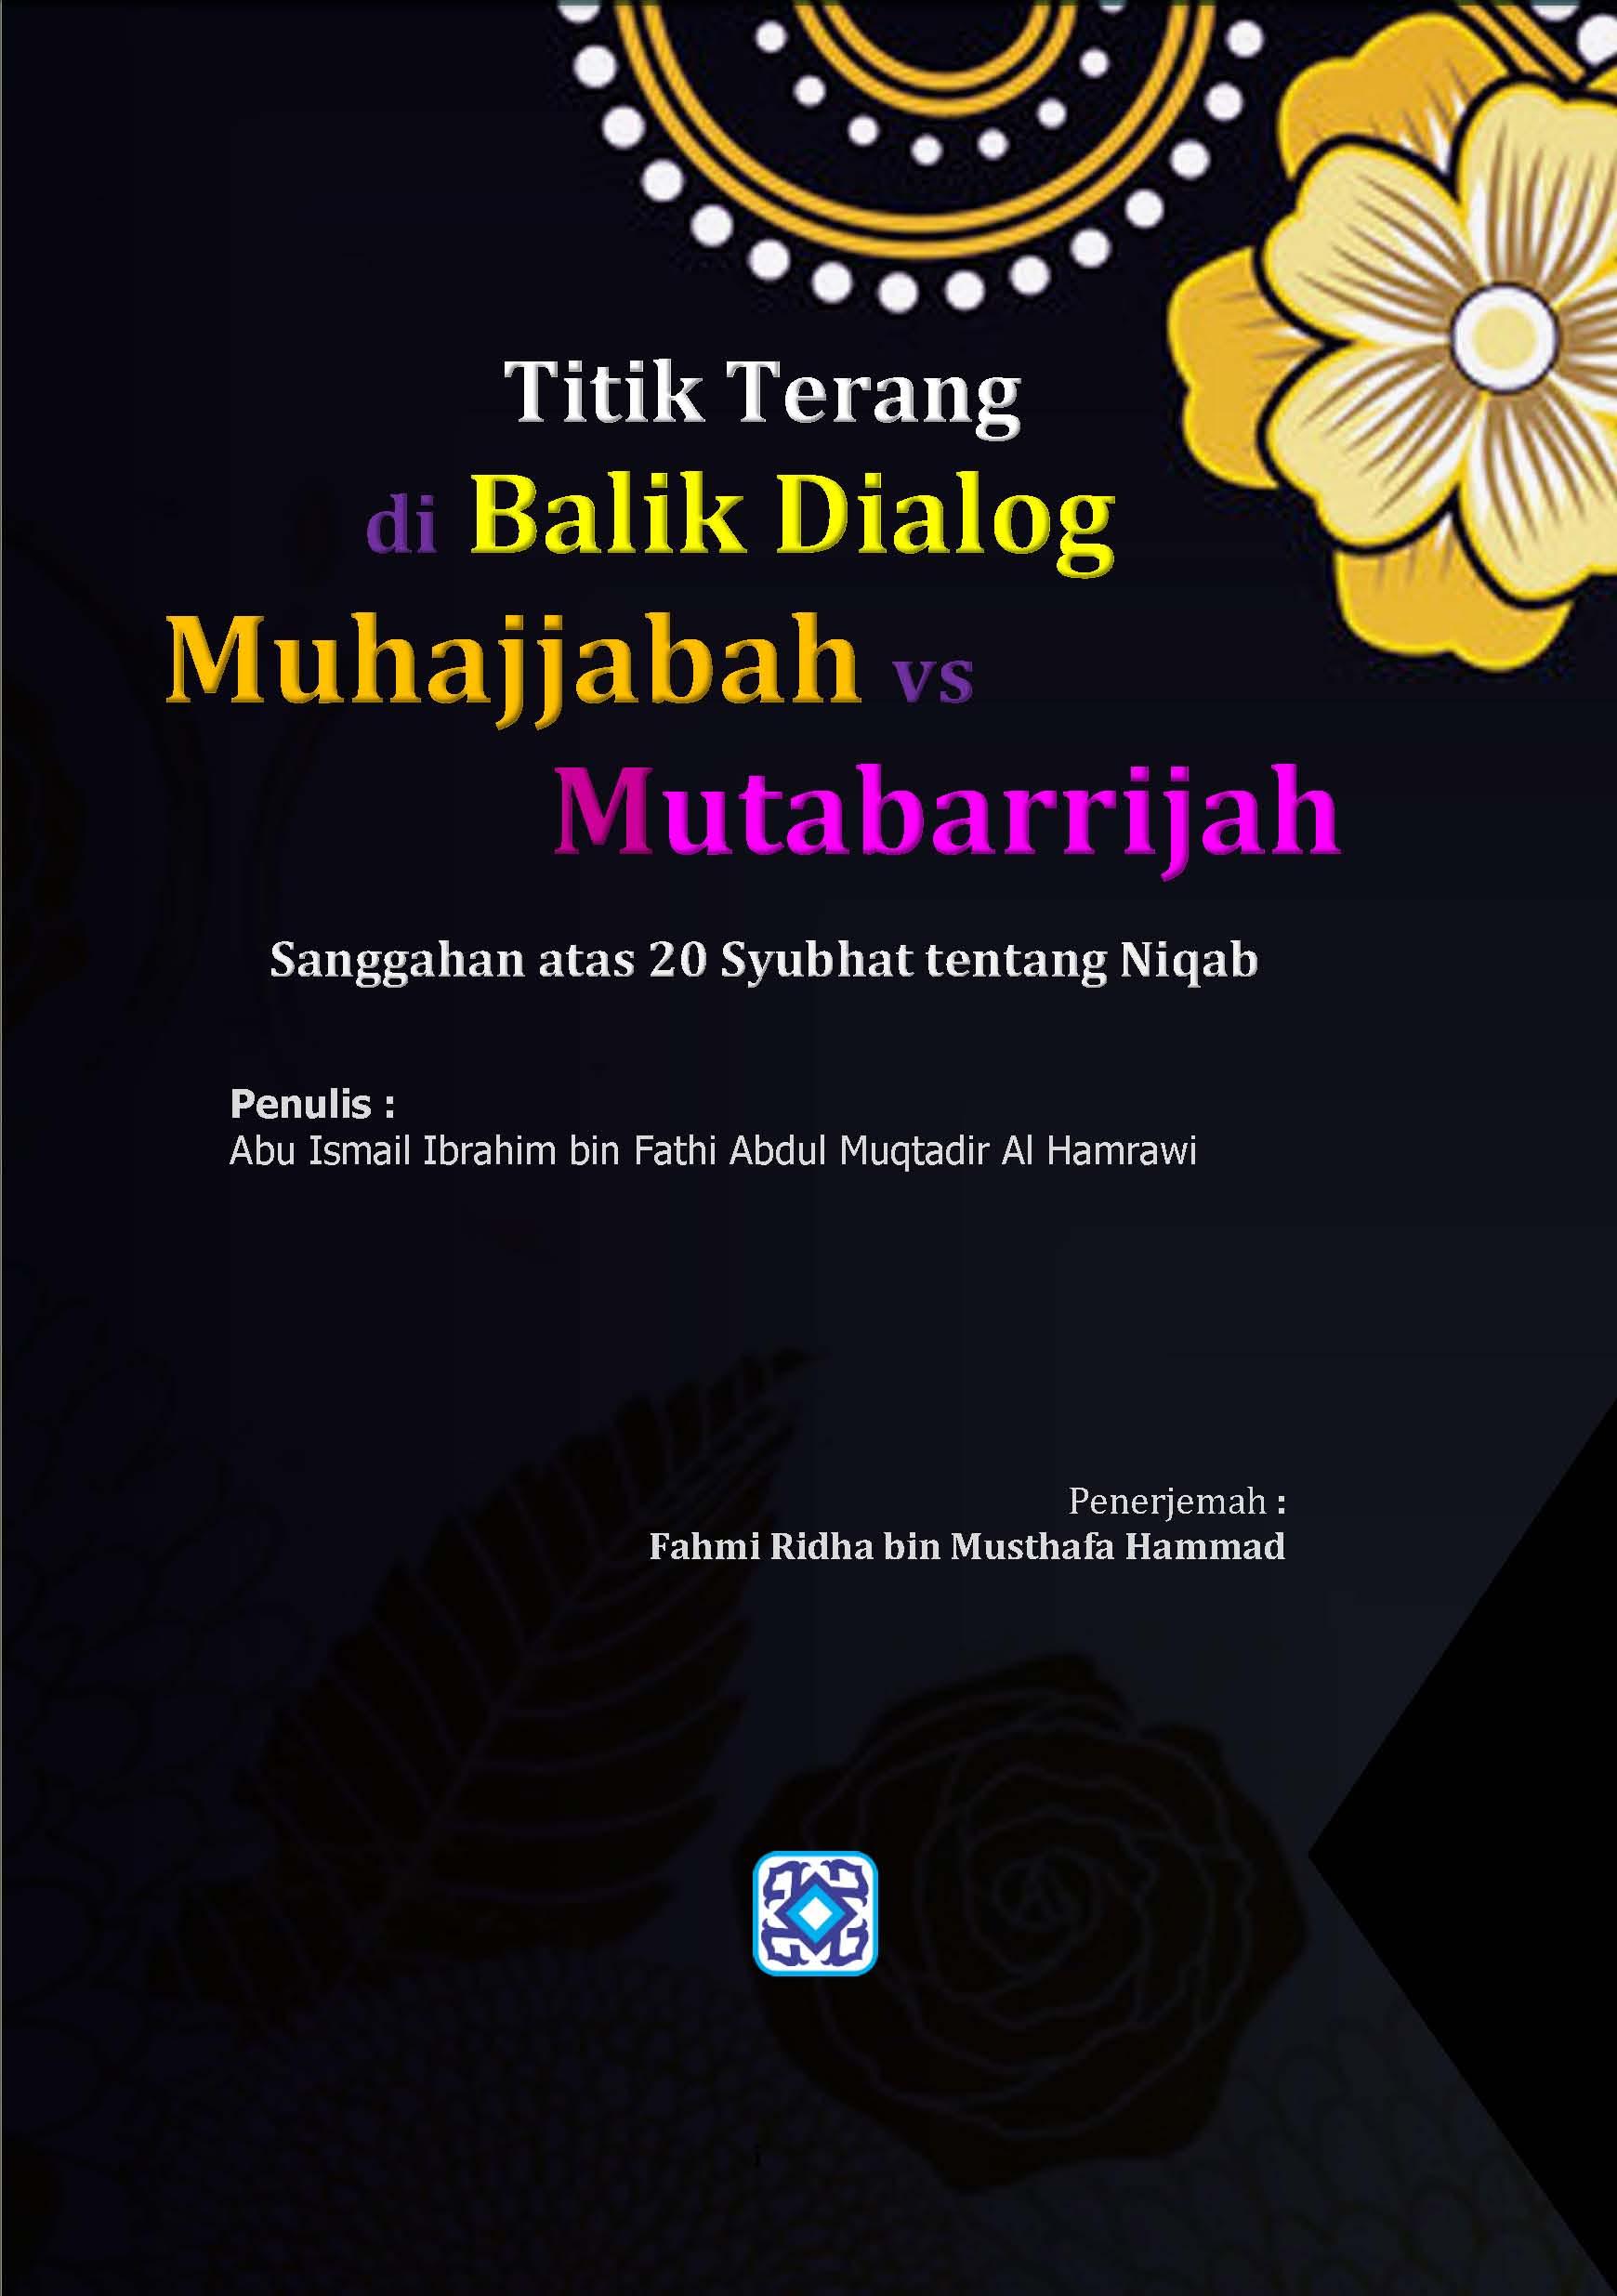 Titik terang di balik dialog muhajjabah vs mutabarrijah, sanggahan atas 20 syubhat tentang niqab [sumber elektronis]